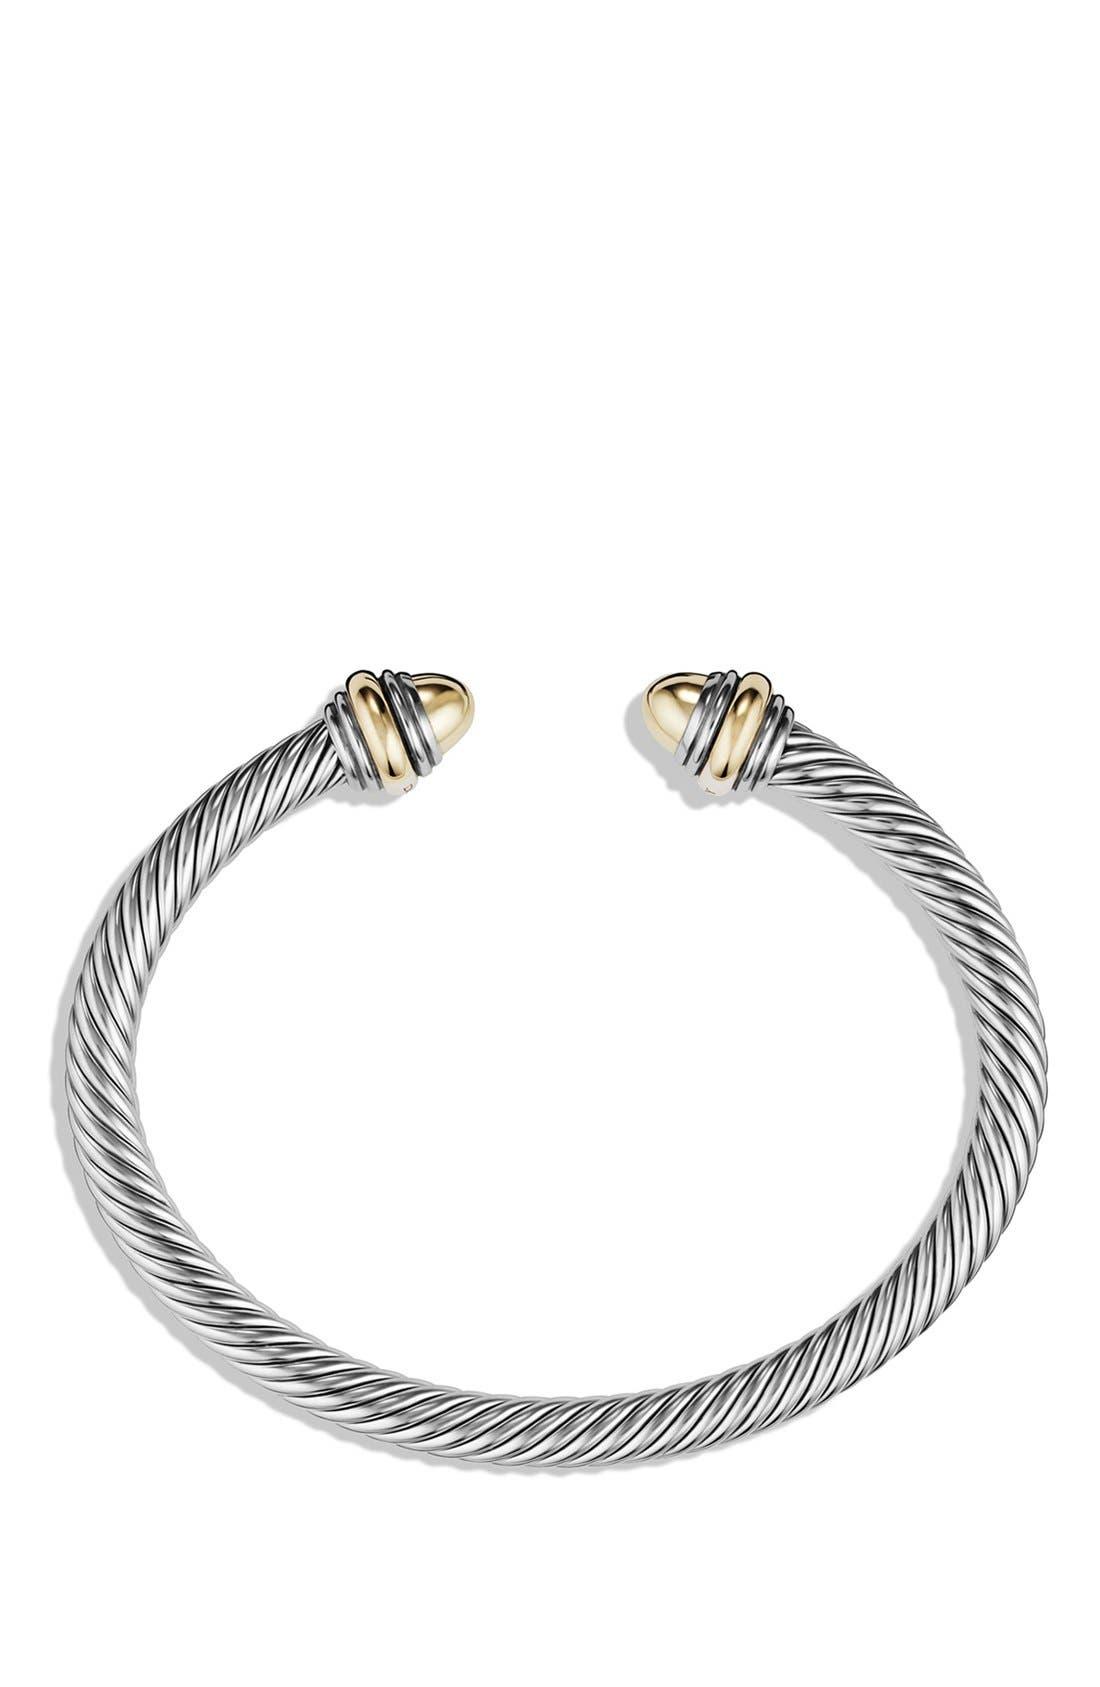 Alternate Image 2  - David Yurman 'Cable Classic' Bracelet with Gold